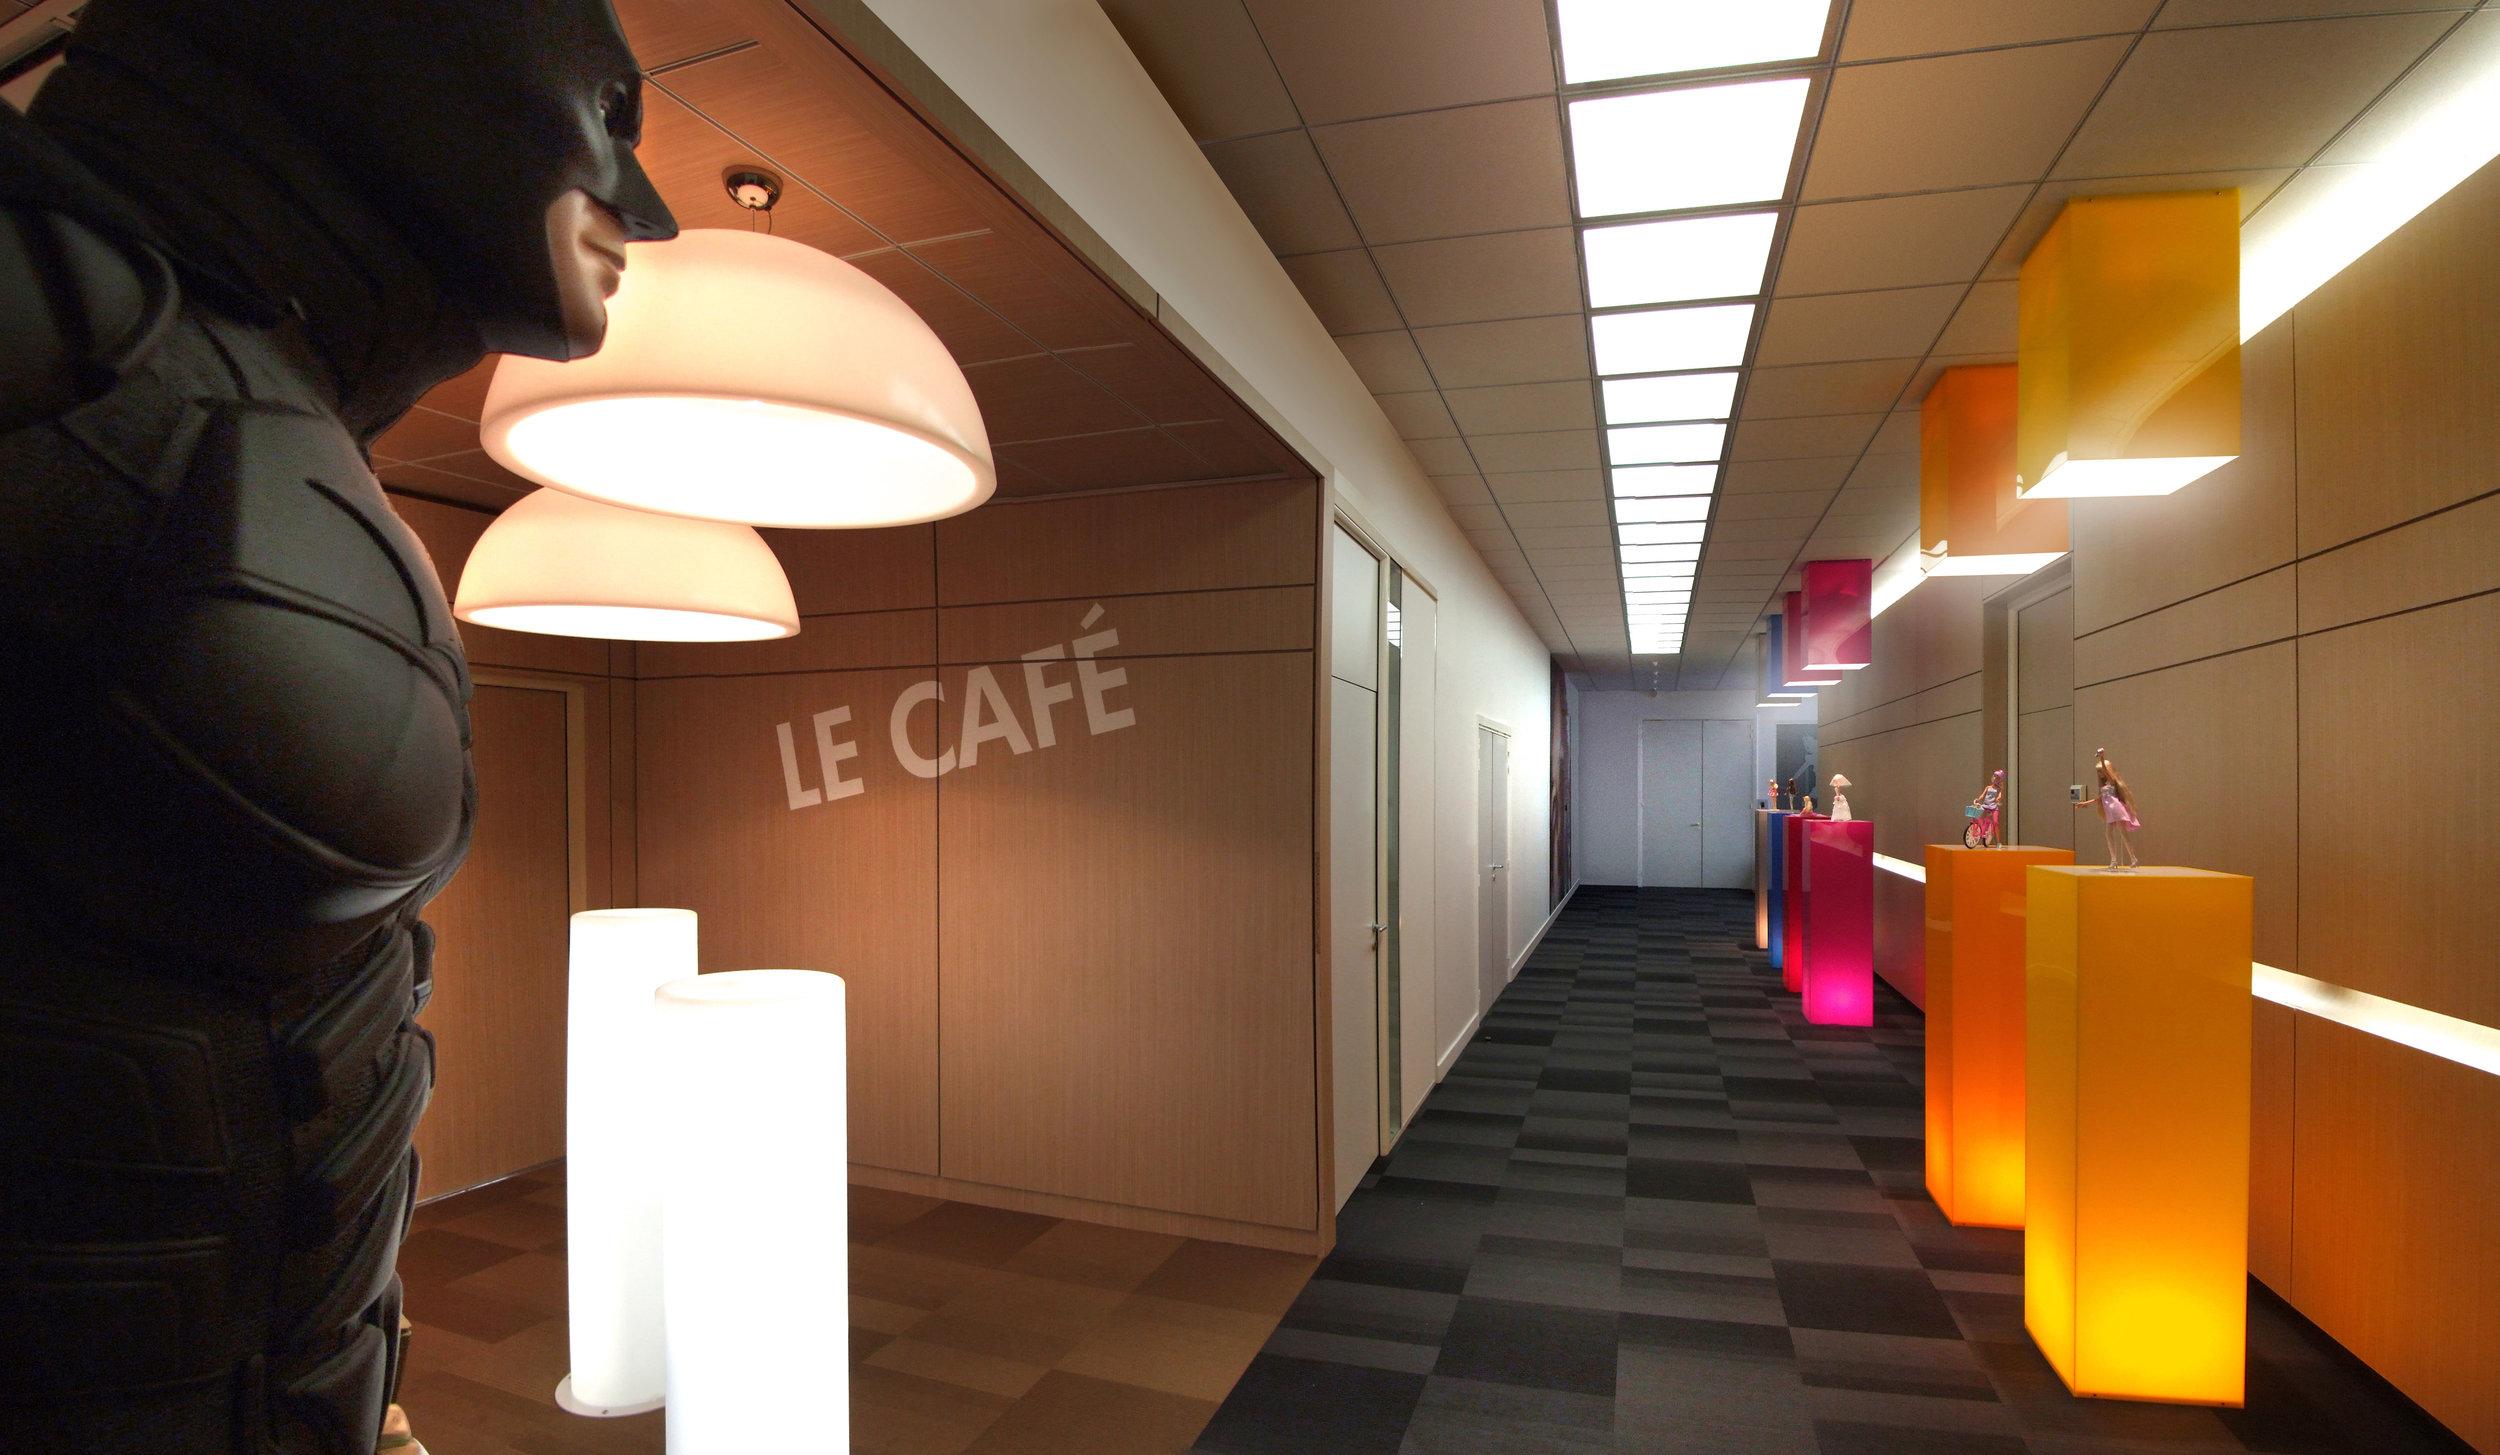 agencement-espace-scenographie-siège-mattel-agence-narrative.jpg